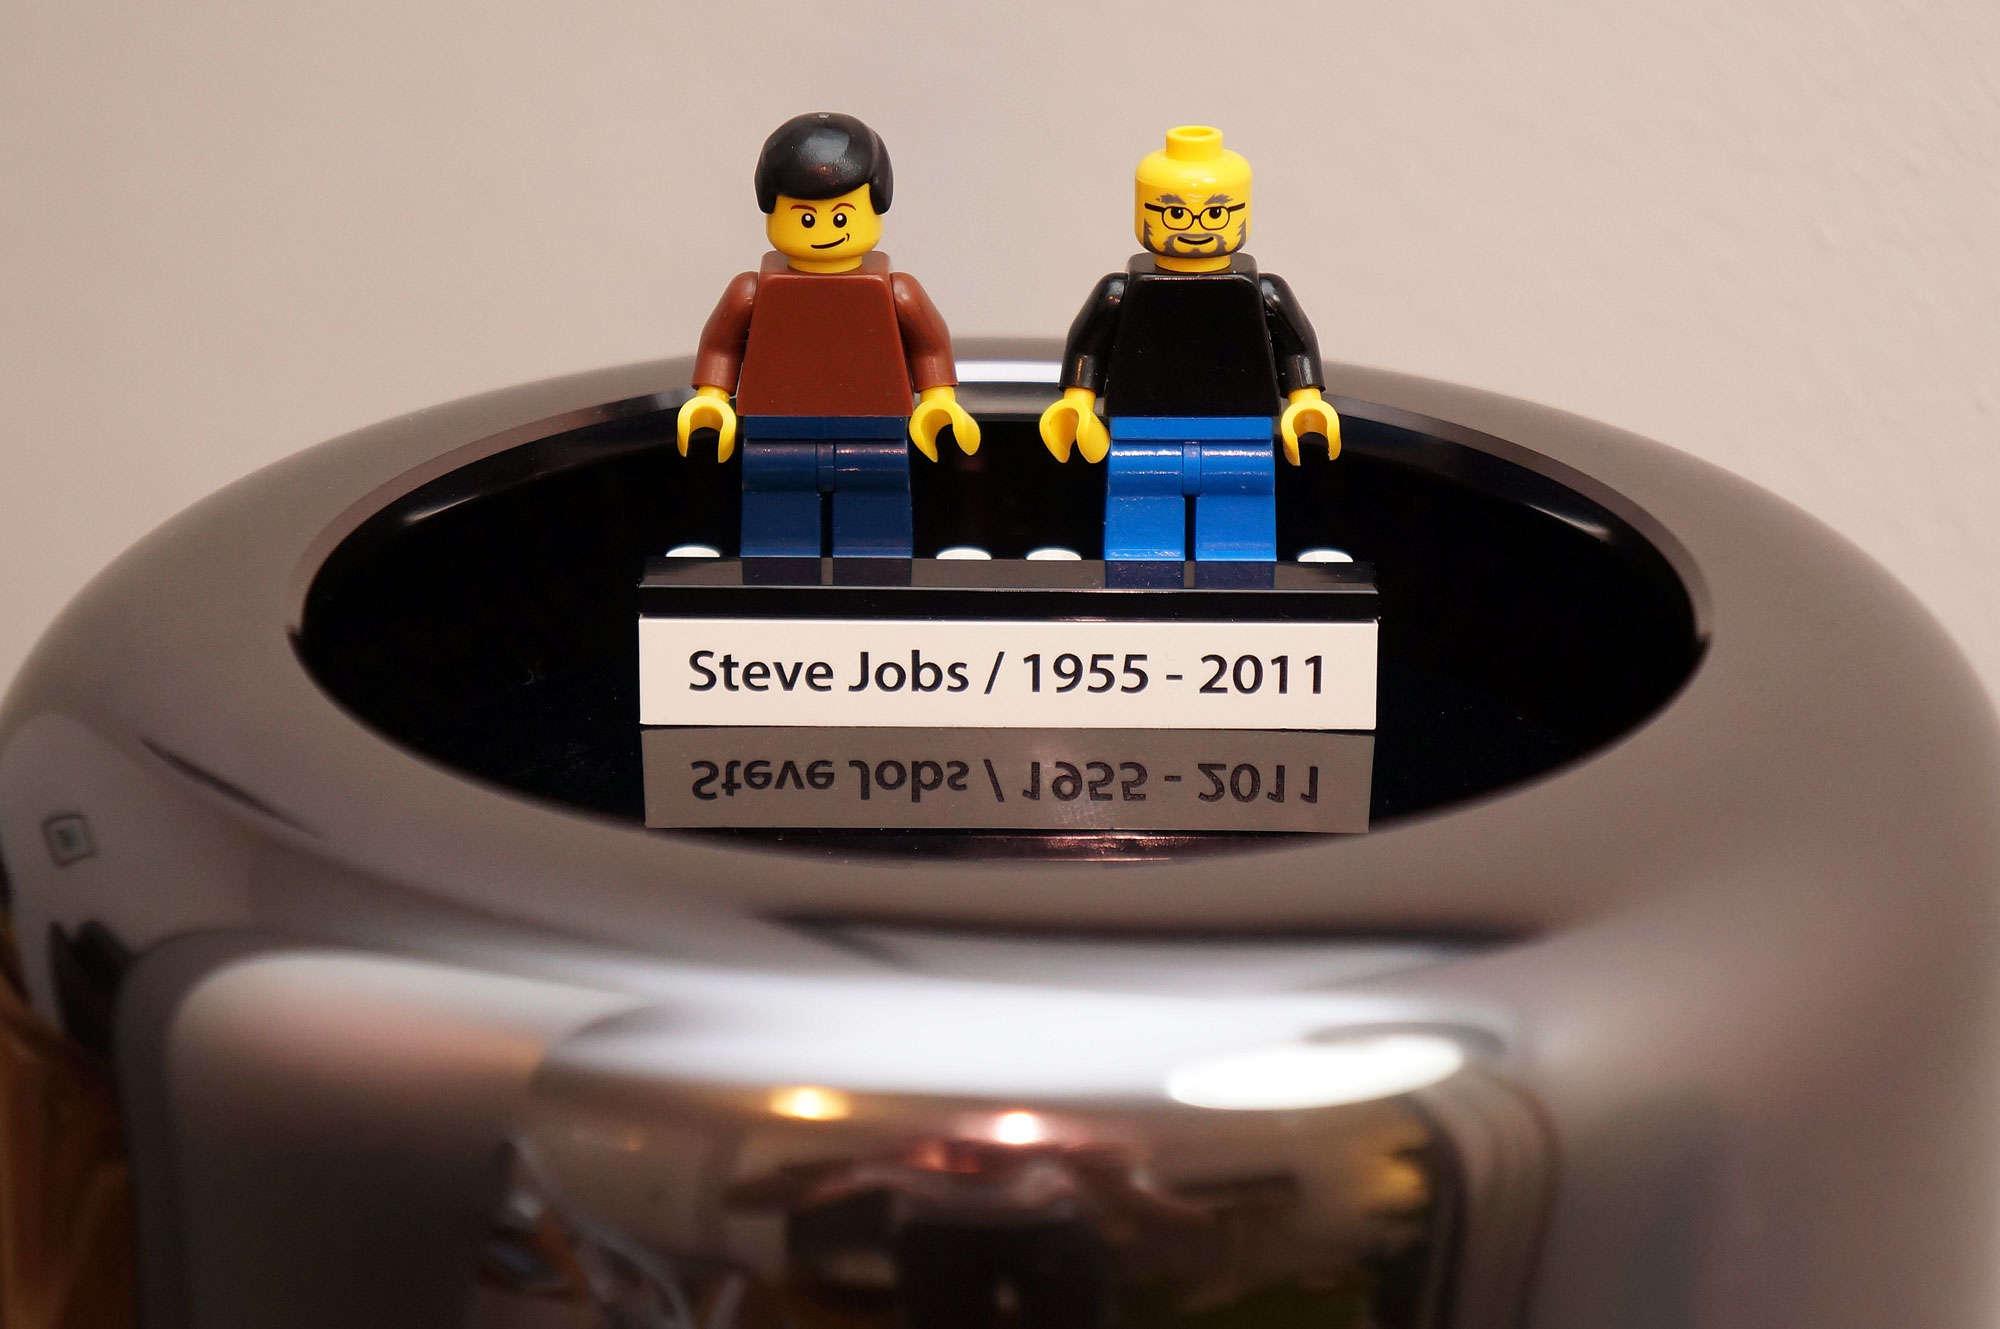 Steve Jobs custom Lego figures